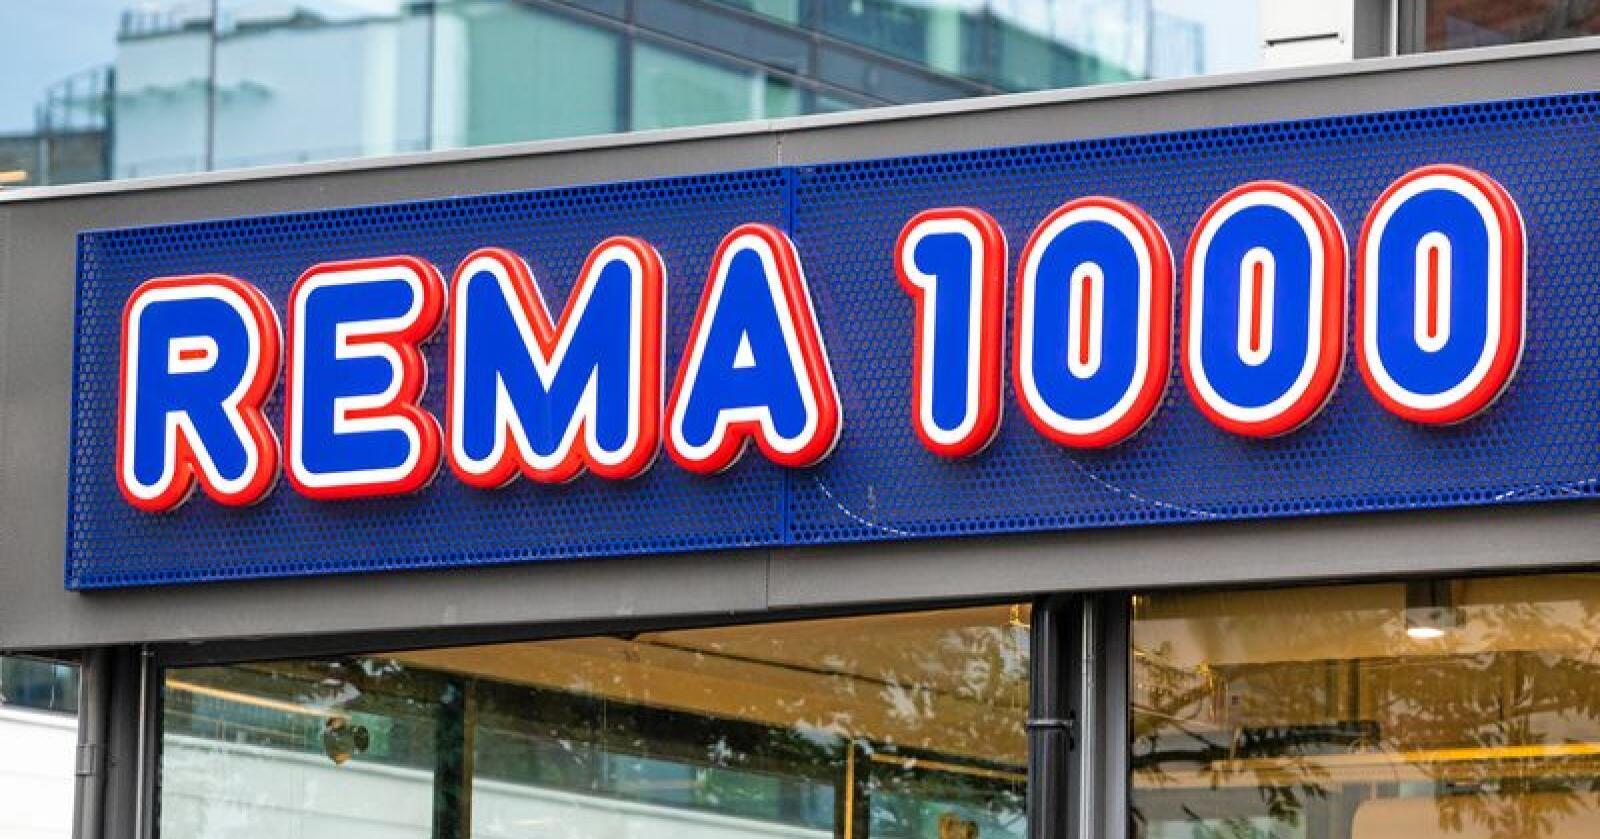 Rema 1000 sier de merker en økt interesse for sauekjøtt. Foto: Audun Braastad / NTB scanpix